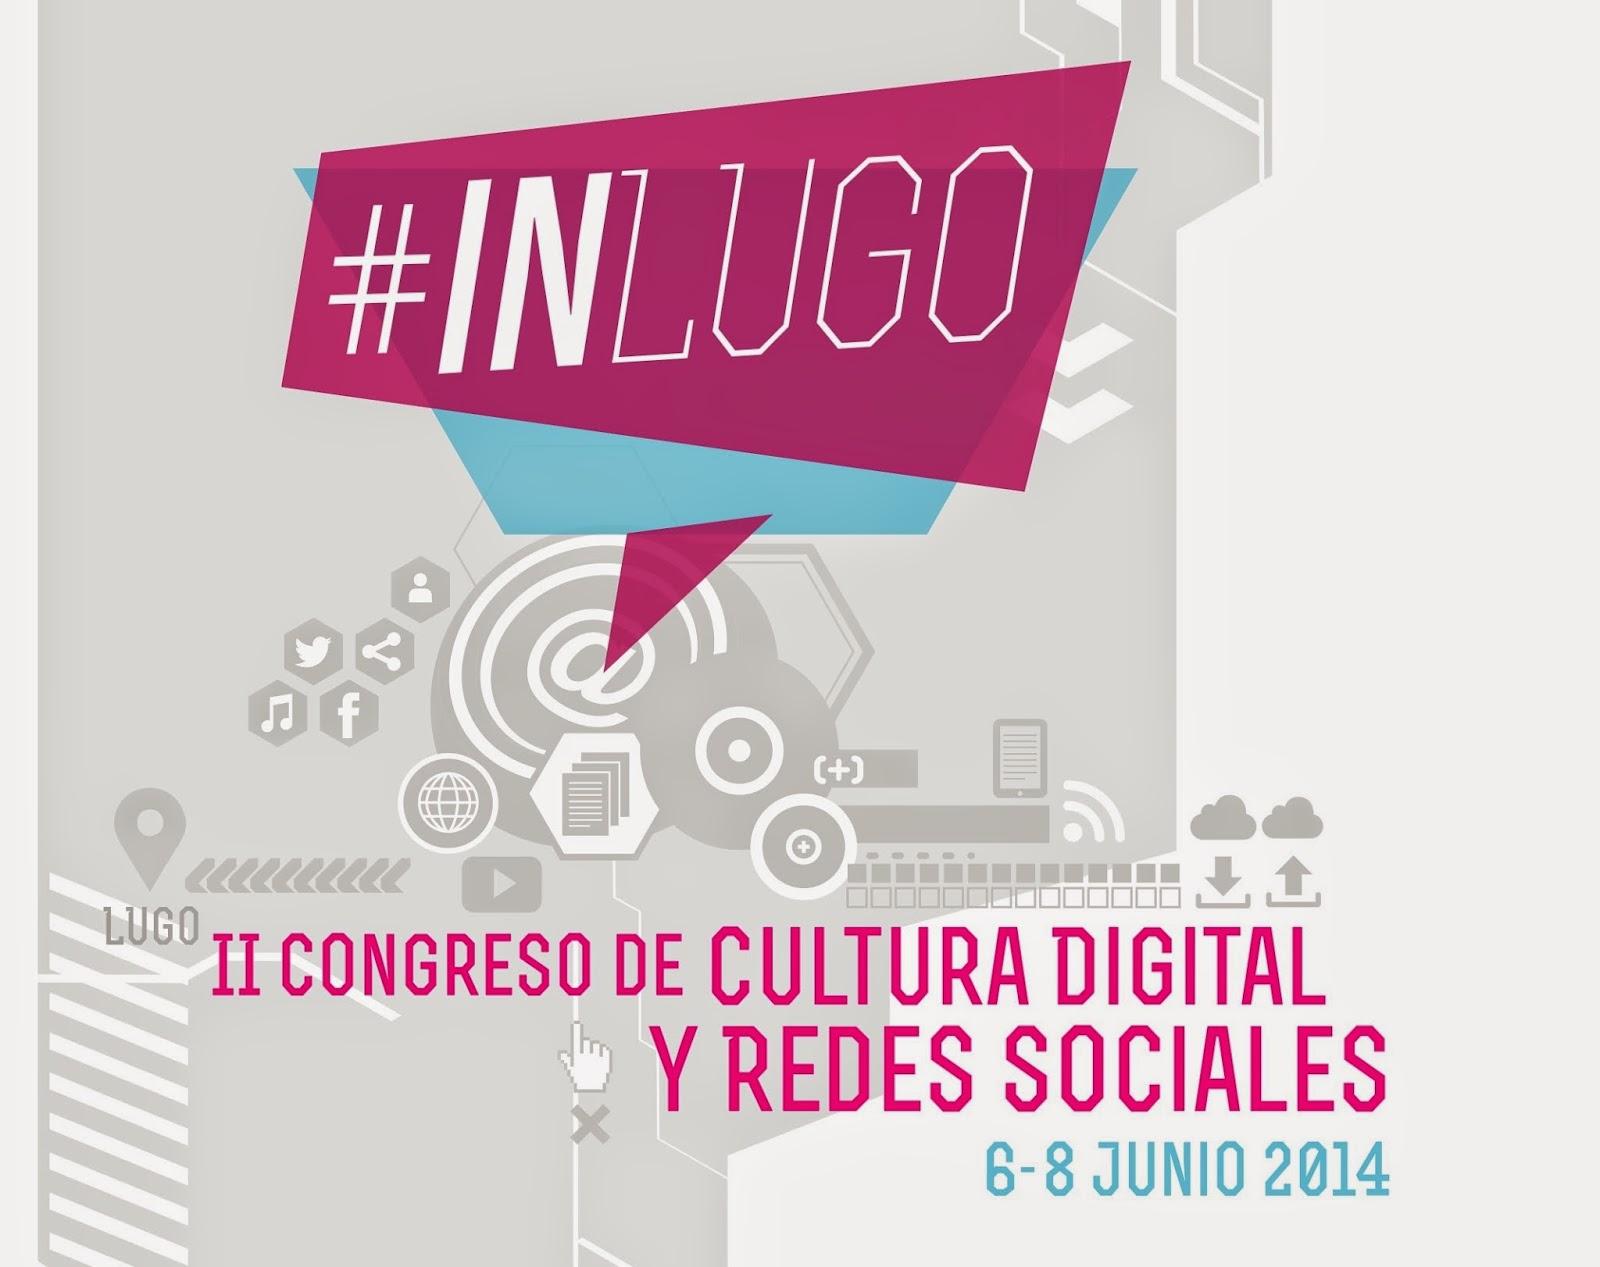 InLugo, redes sociales, congreso, blogging, internet, comunicación, socialmedia,